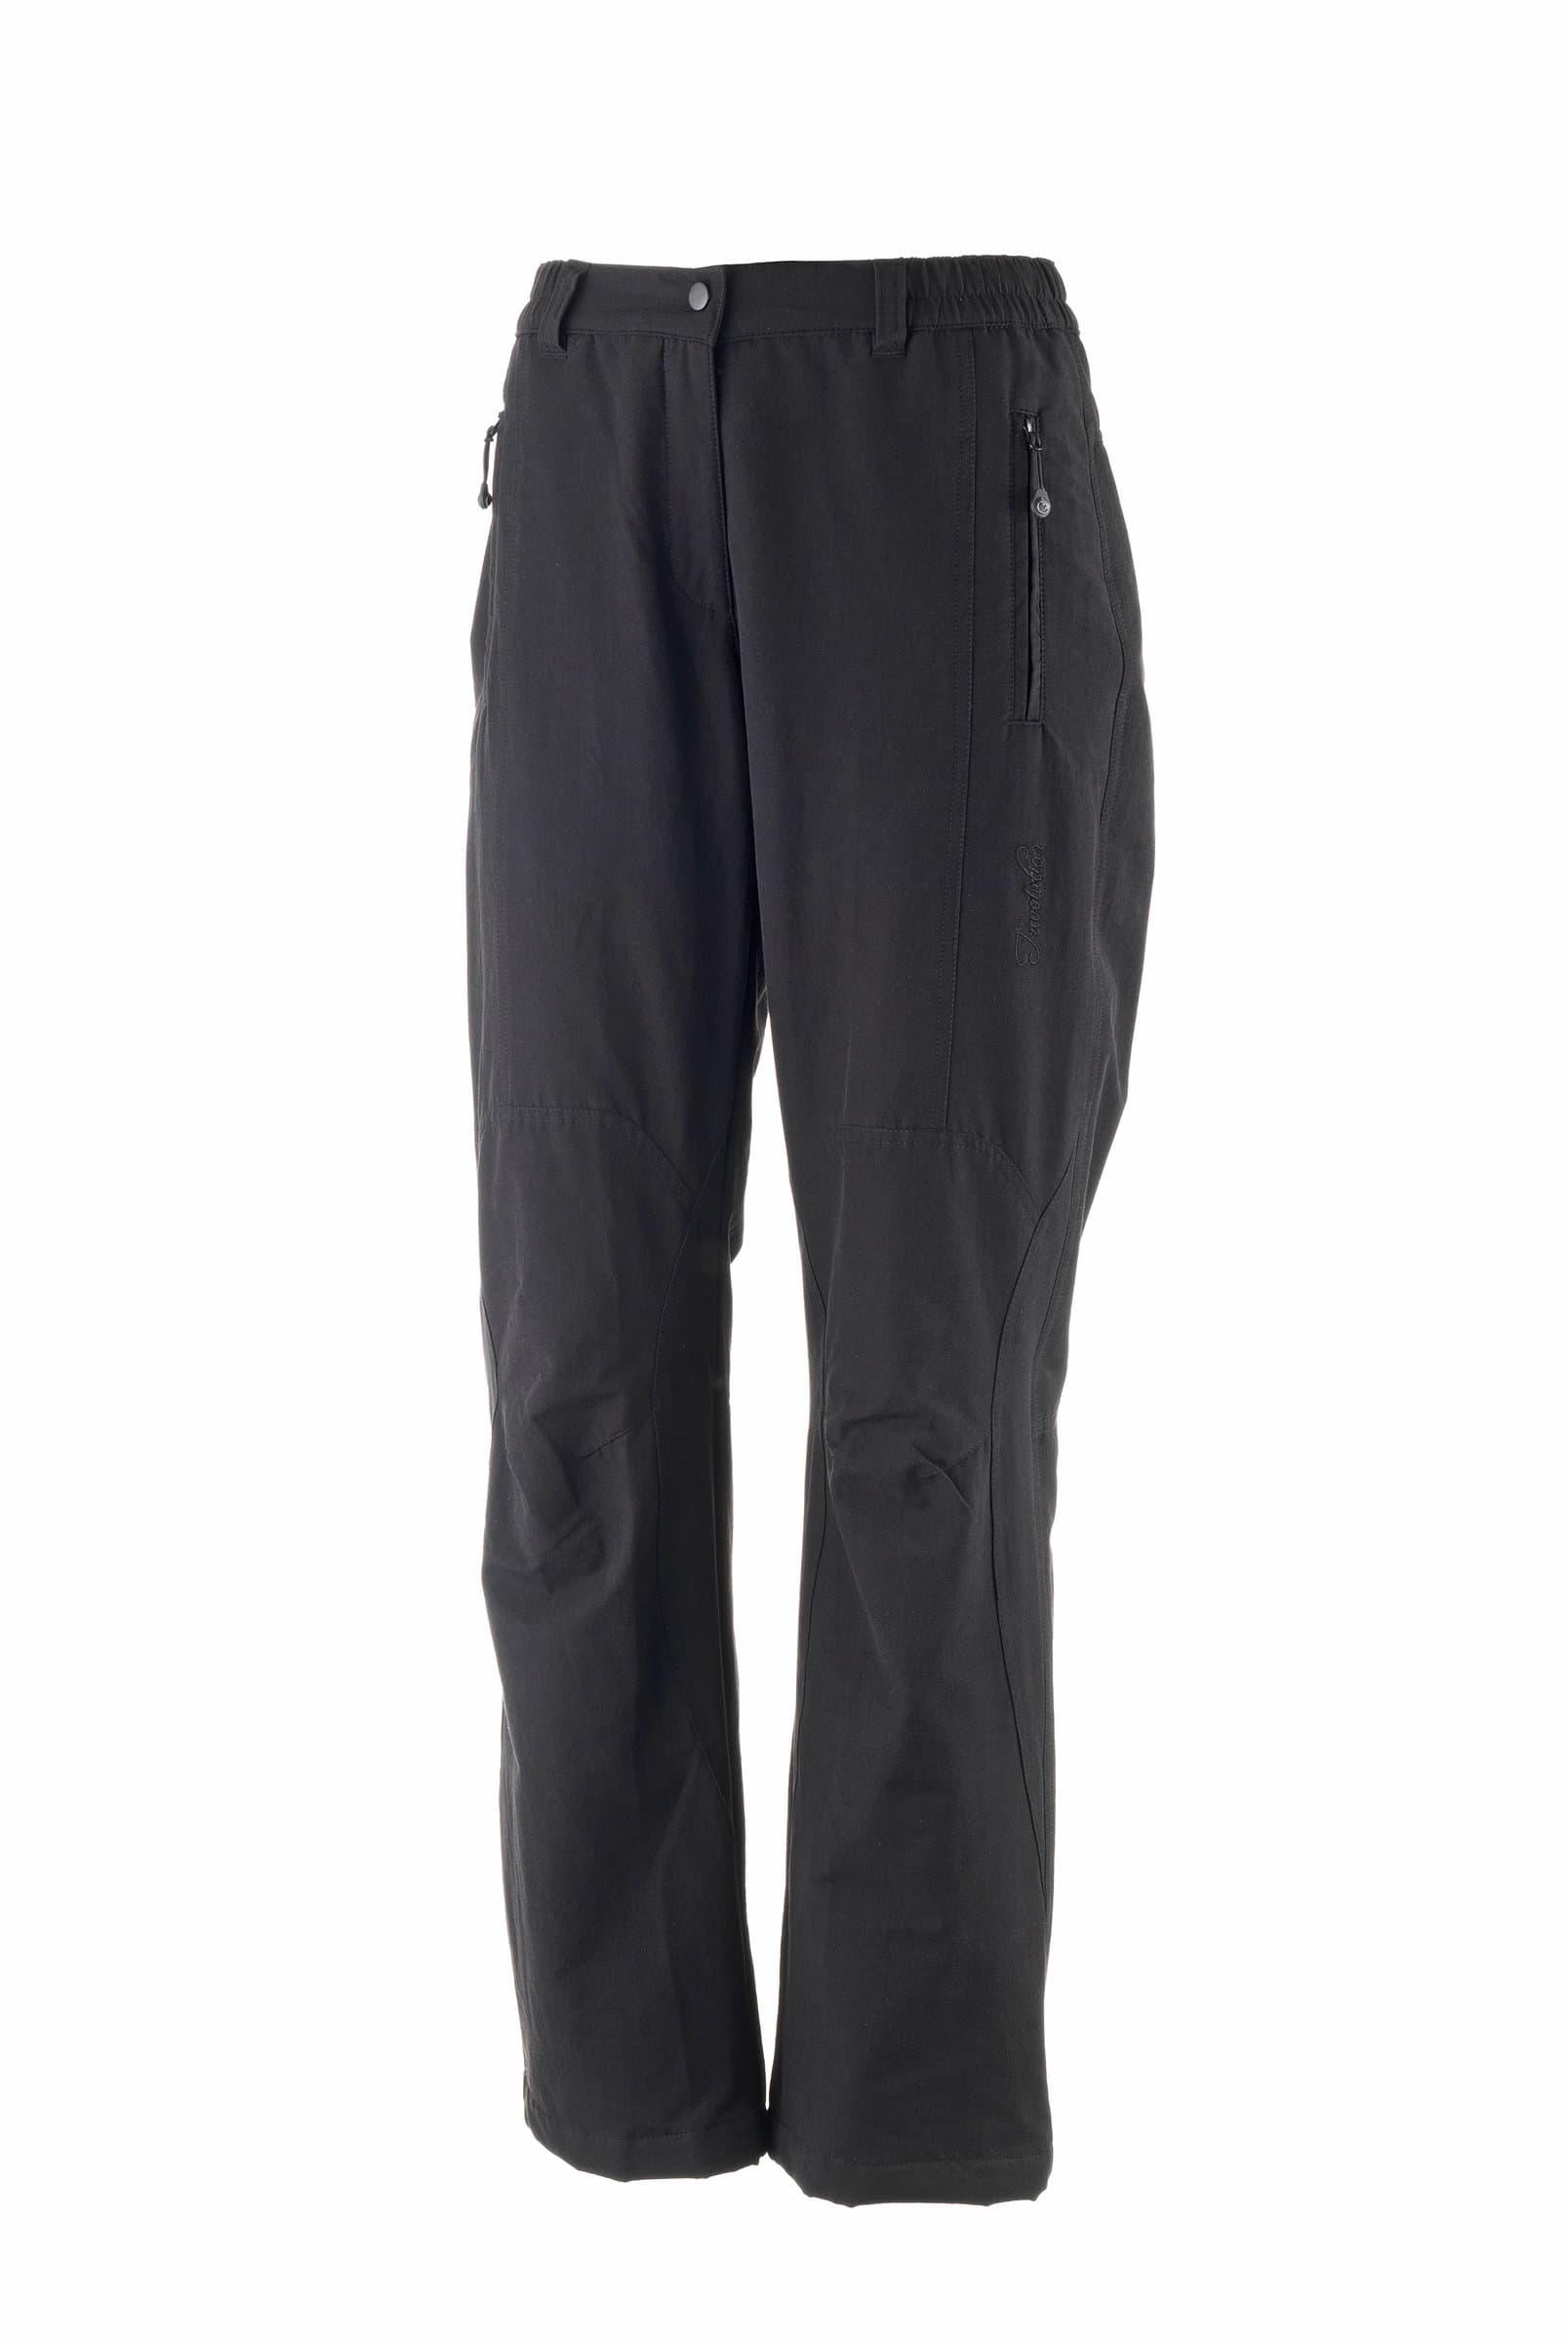 Trevolution Thermo Damen-Trekkinghose